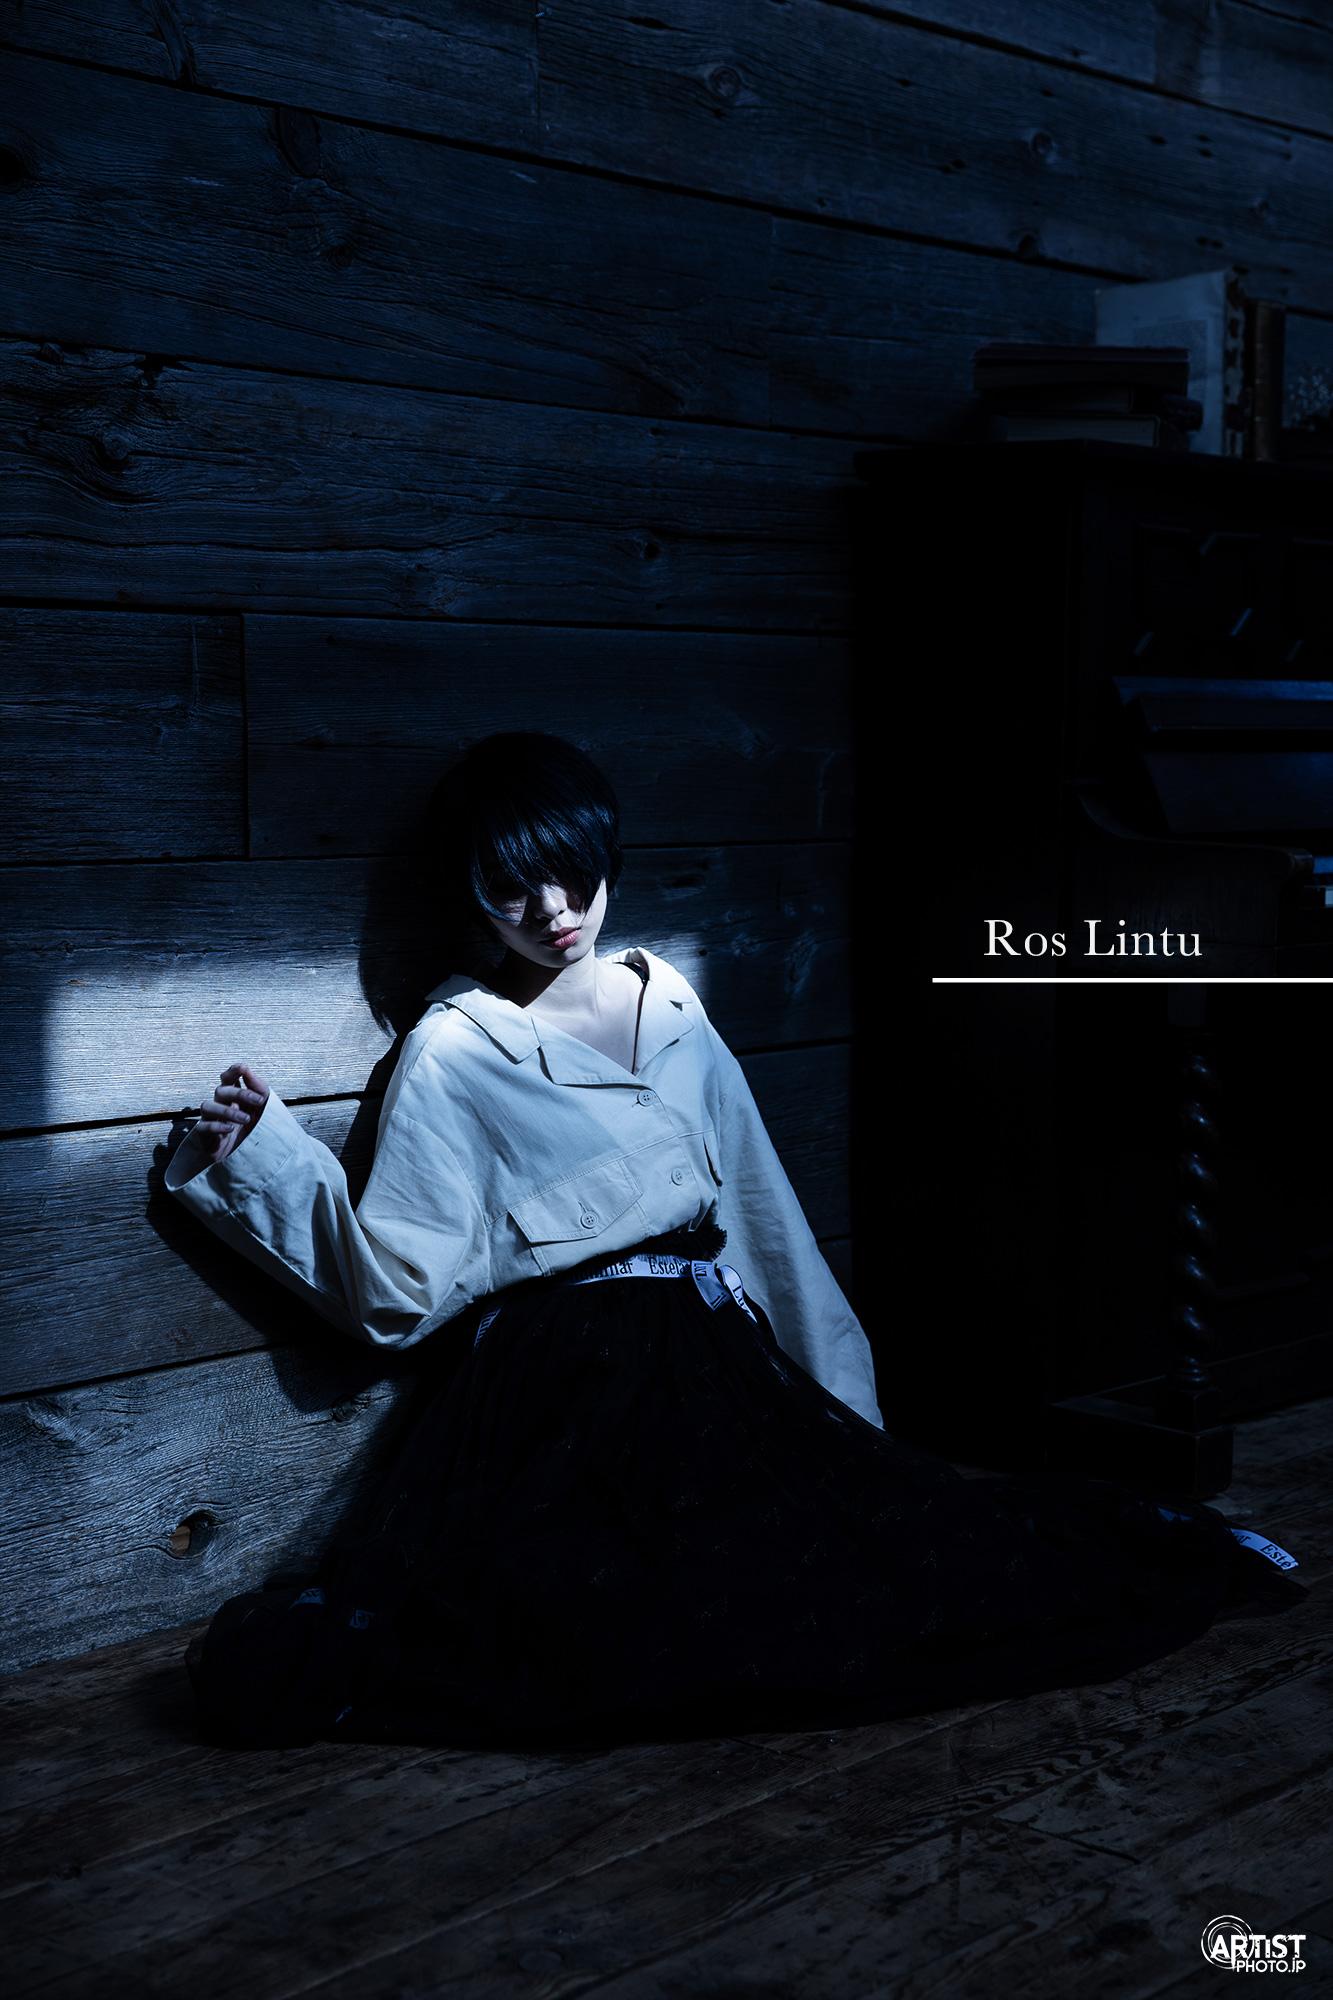 Ros Lintuアーティスト写真